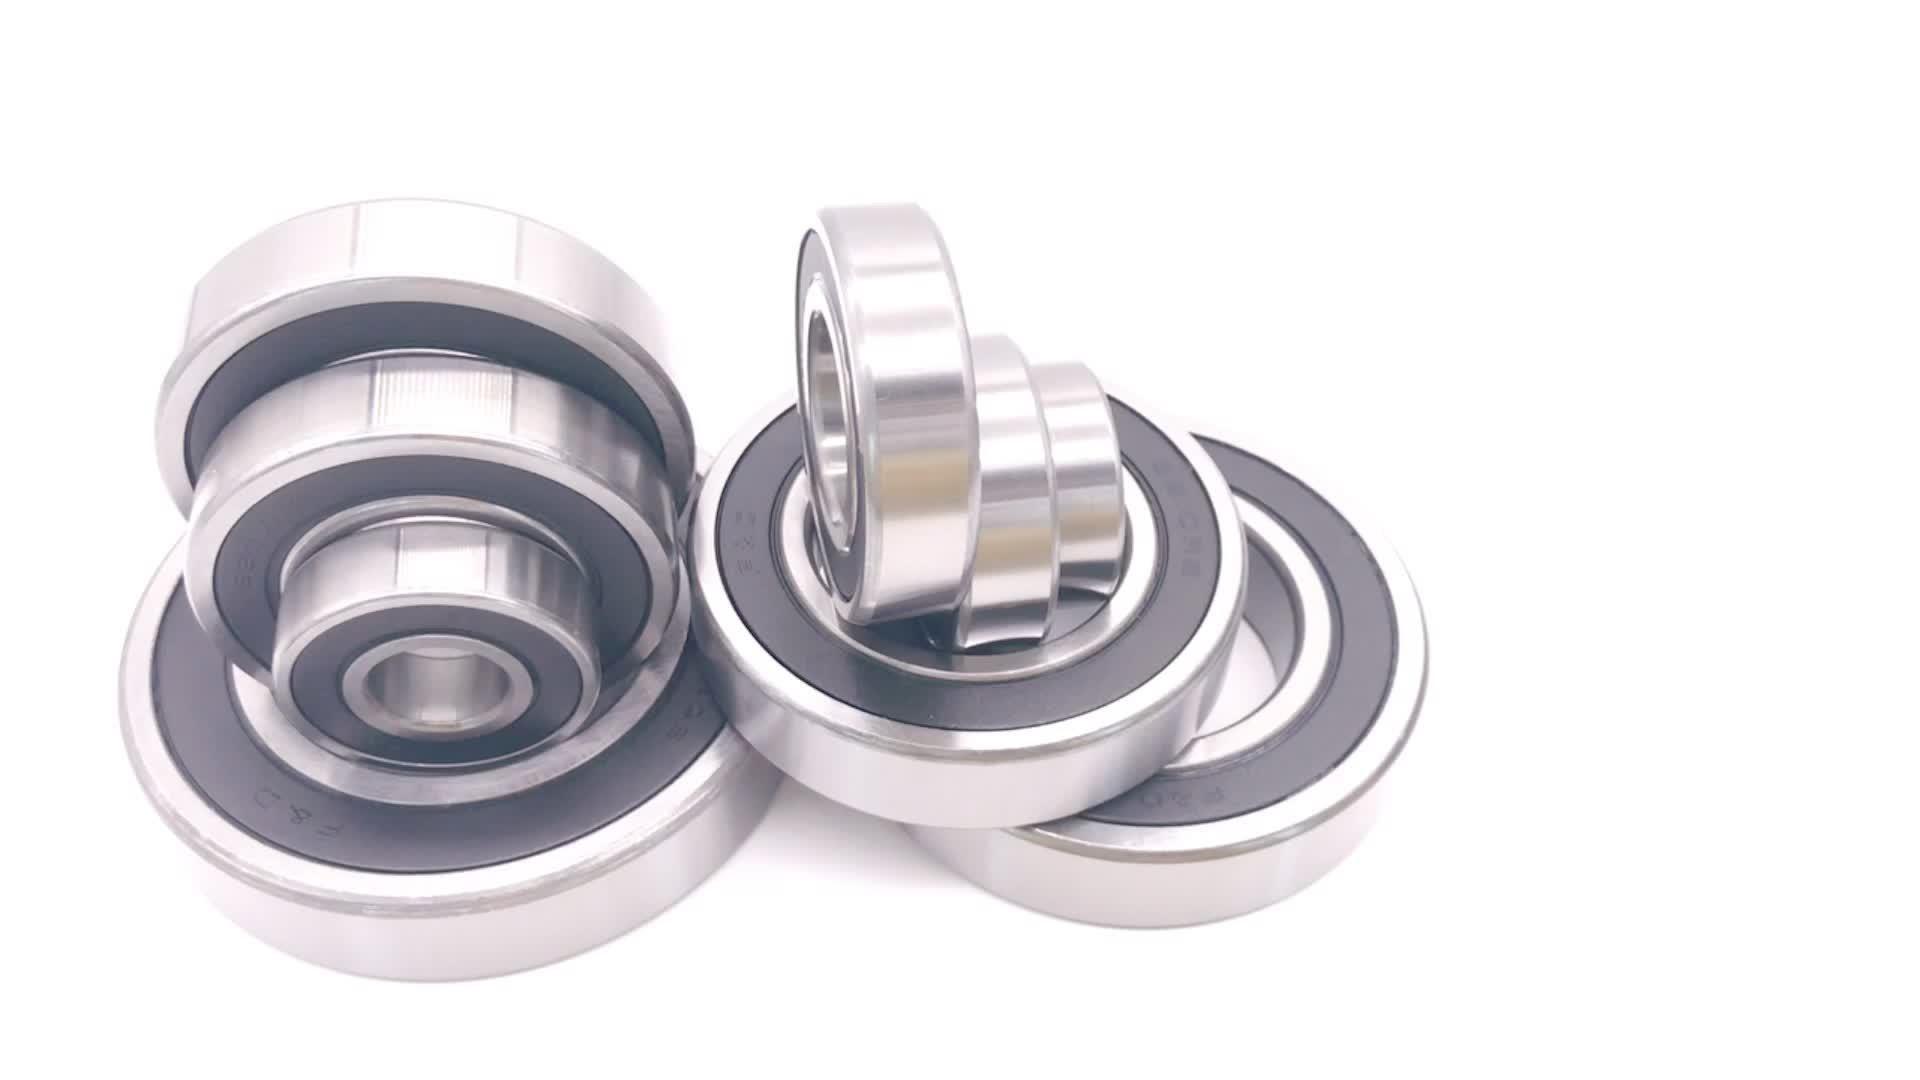 manufacturer 6215-2rs 6215 deep groove ball bearing rodamientos de bolas rodamientos